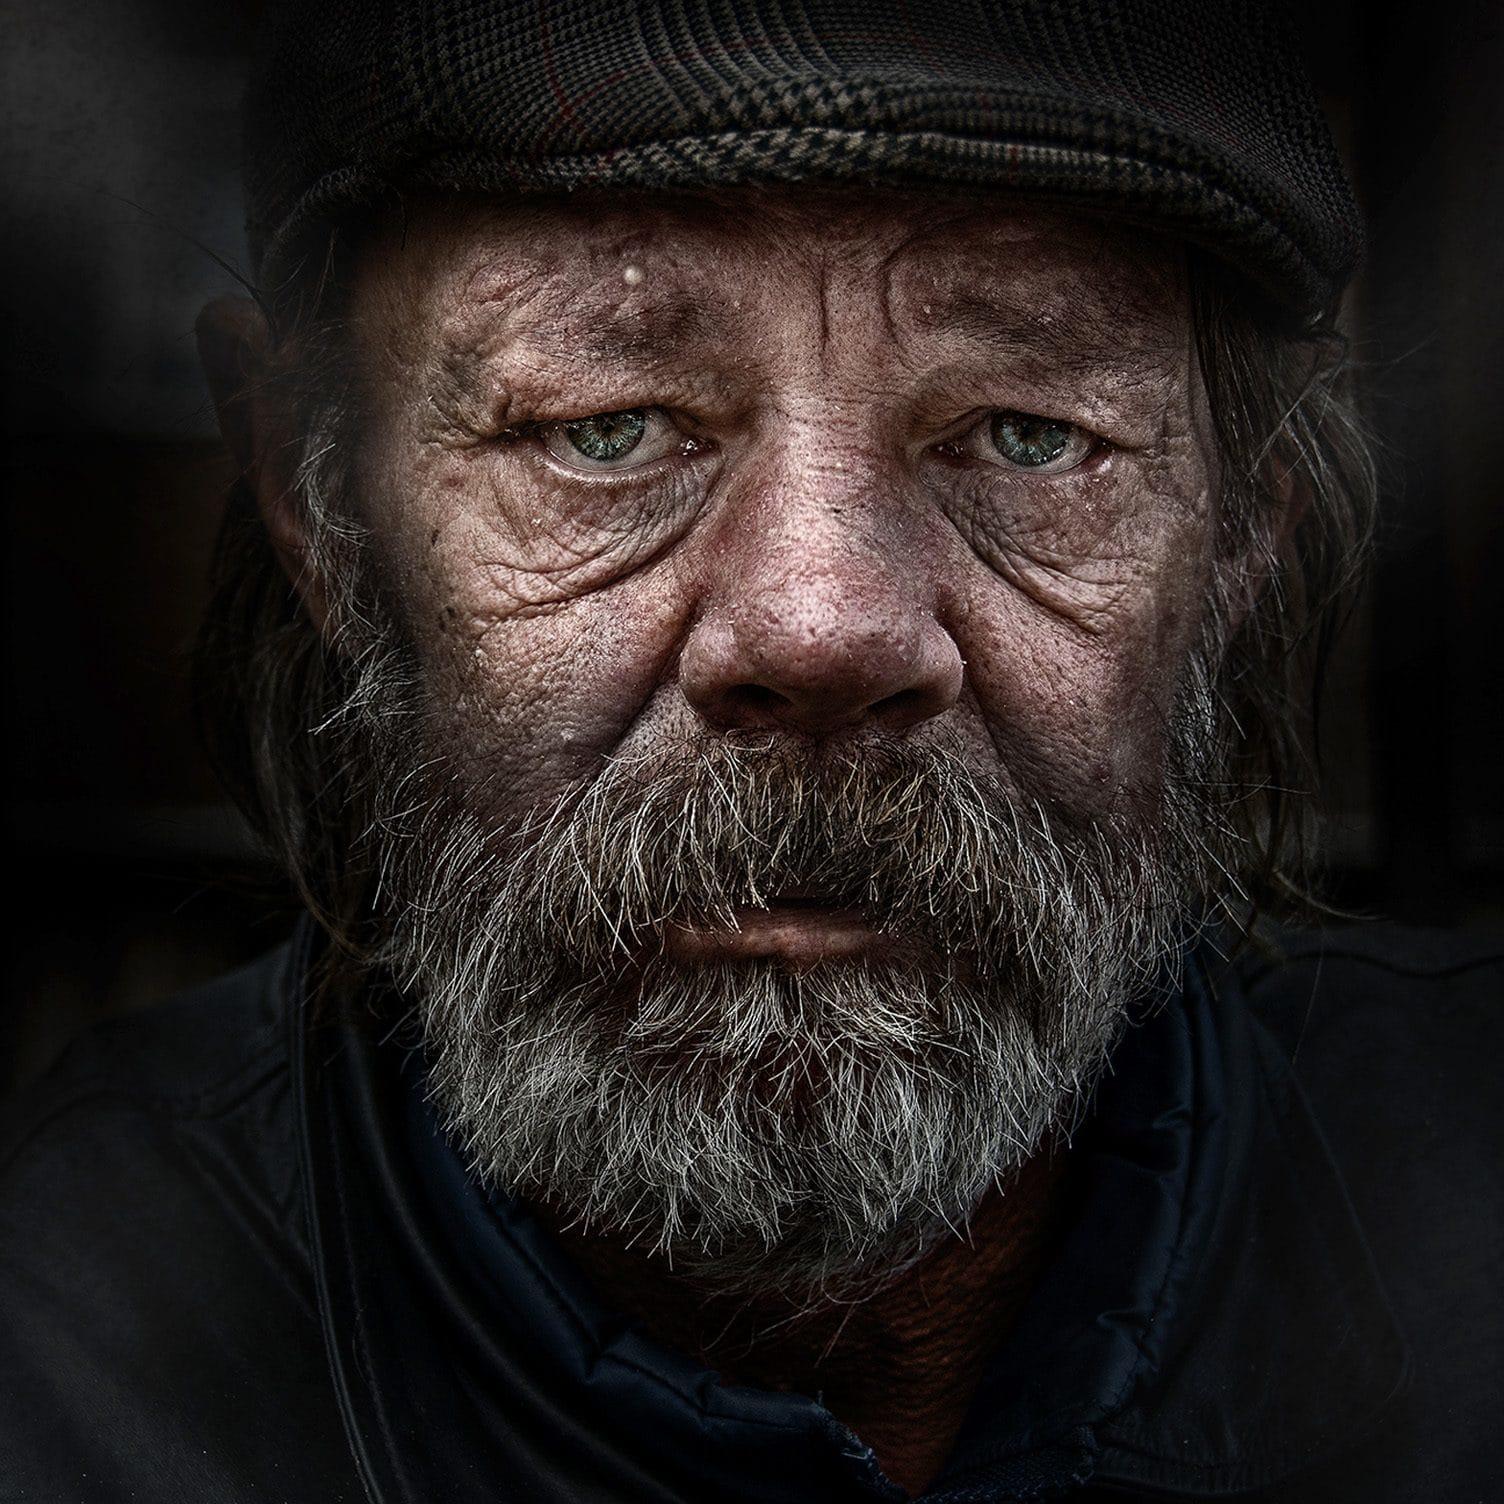 Homeless portraiture photo